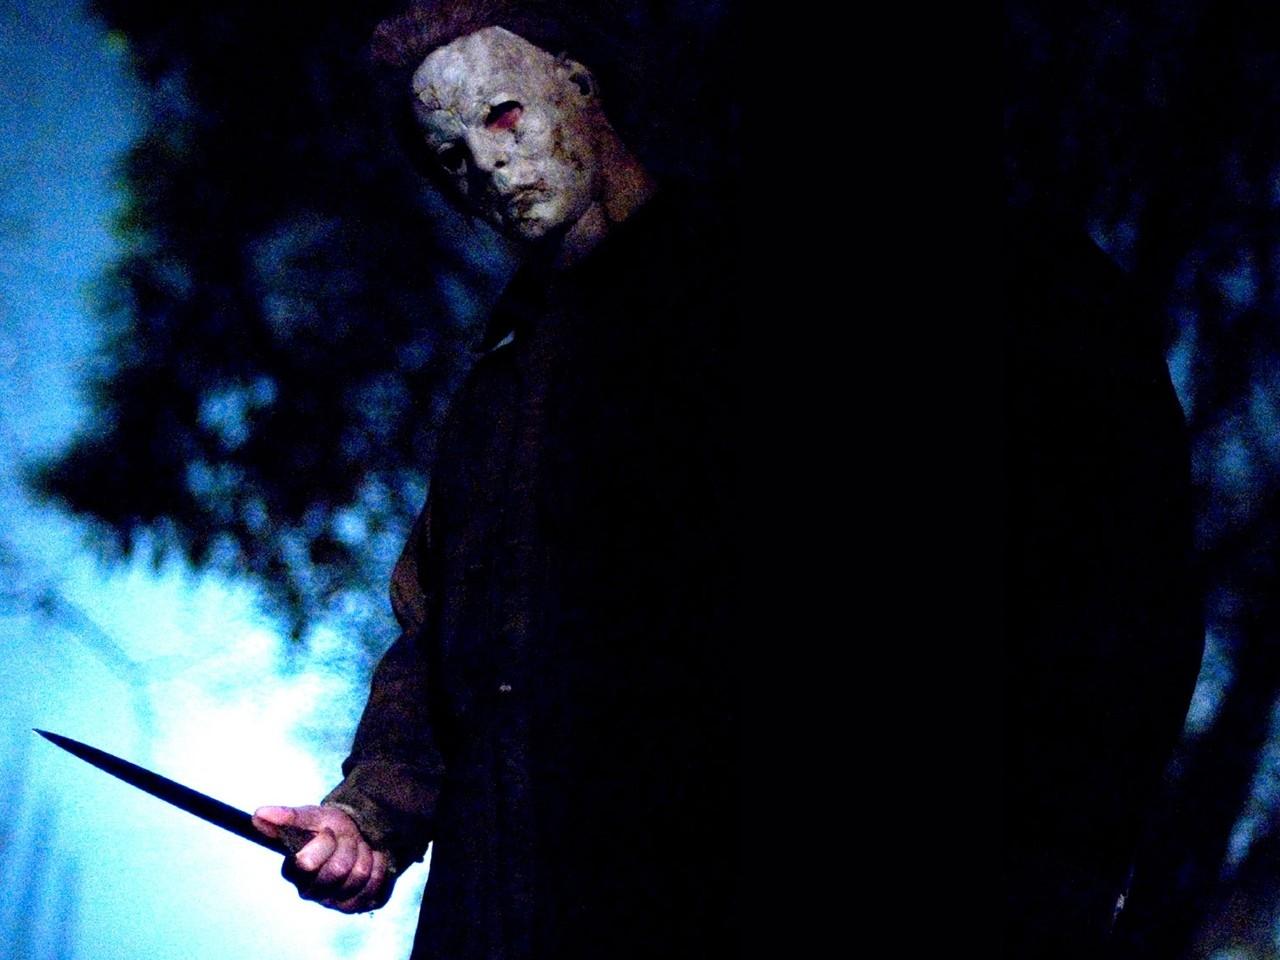 Wallpaper del film Halloween: The beginning (2007)